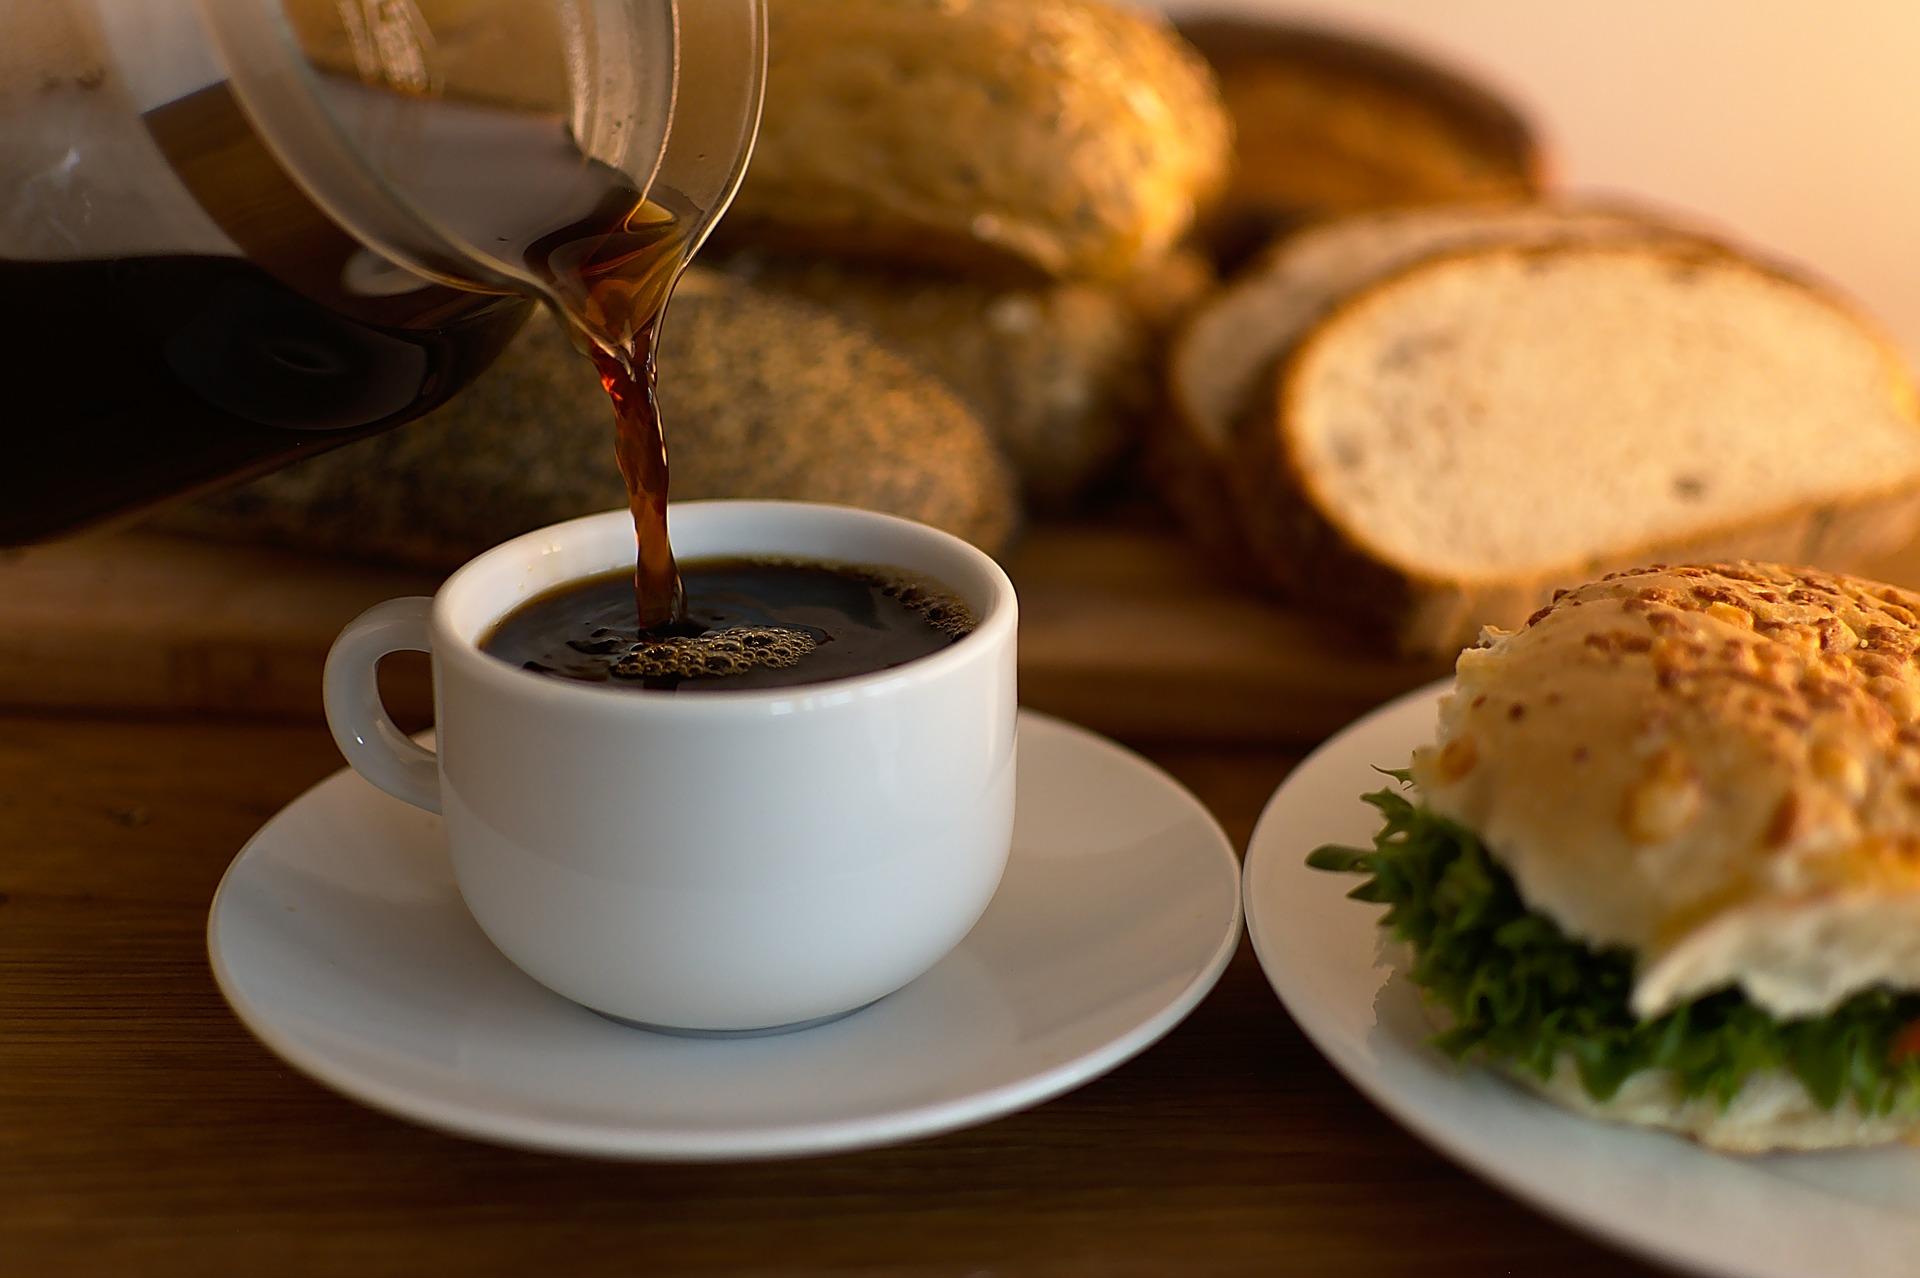 Werken Bij Delwi Groenink Kantine Kopje Koffie